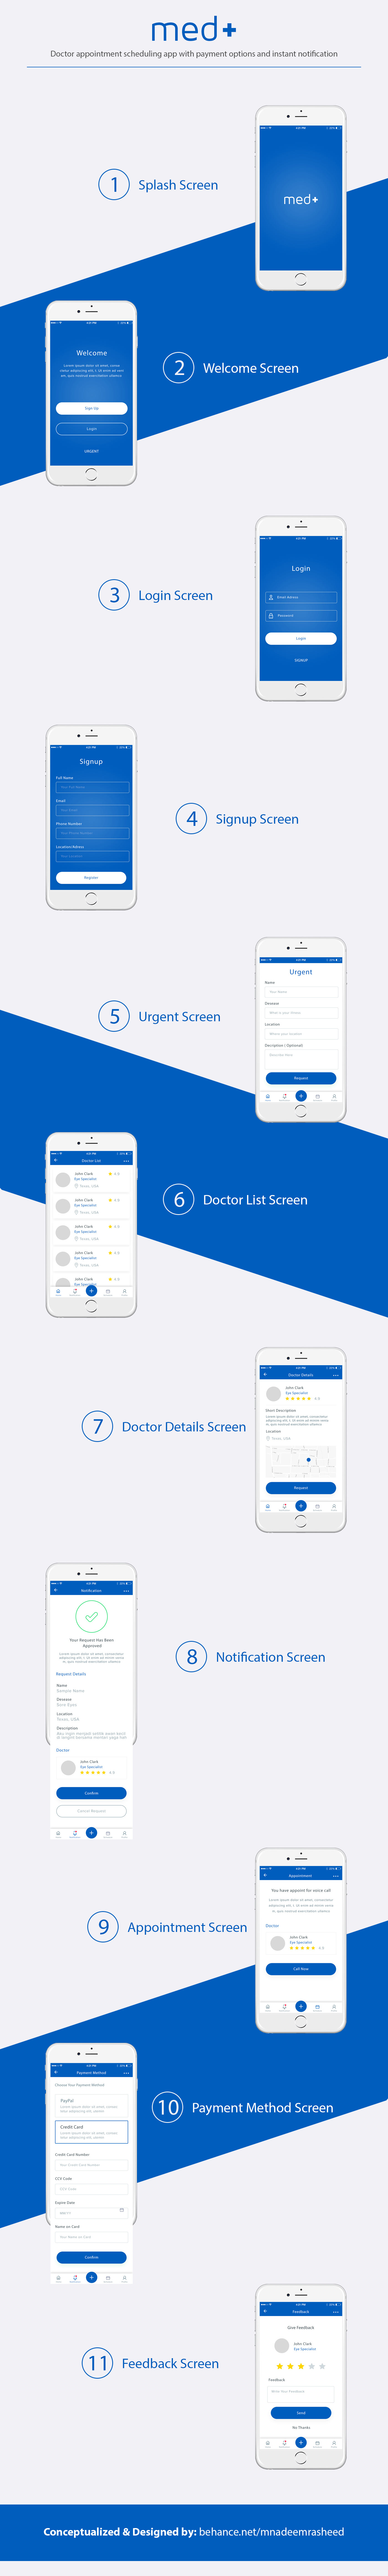 doctor app doctor appointment app Doctor Scheduling App app design iOS App App MockUp Design mobile app design mobile app mockup Doctor App Mockup